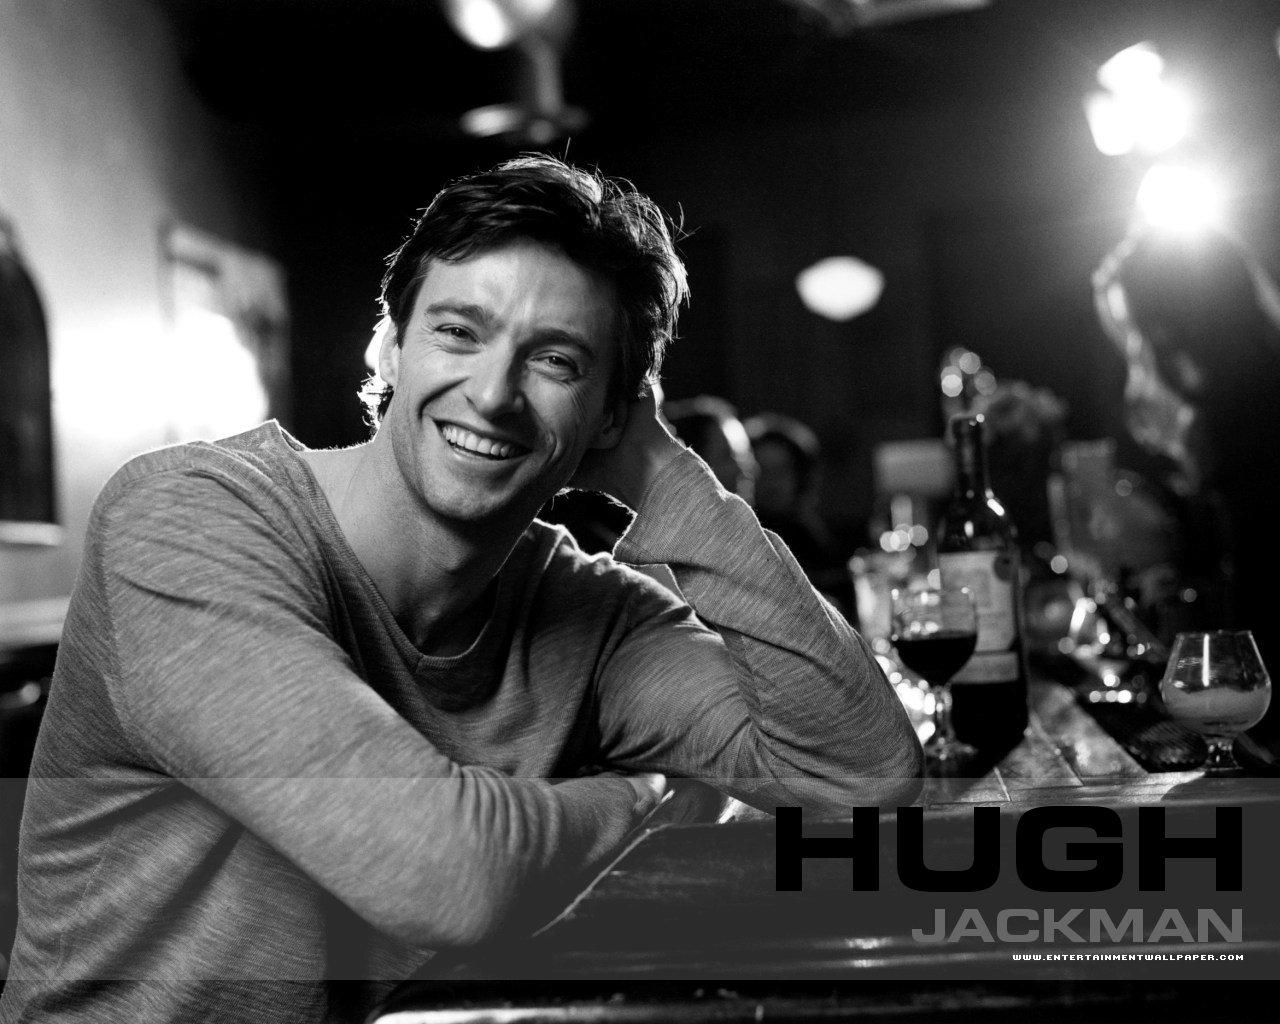 Hugh Jackman Wallpapers Hd: Miley Cyrus Hot: Hugh Jackman Hd Wallpapers 2013